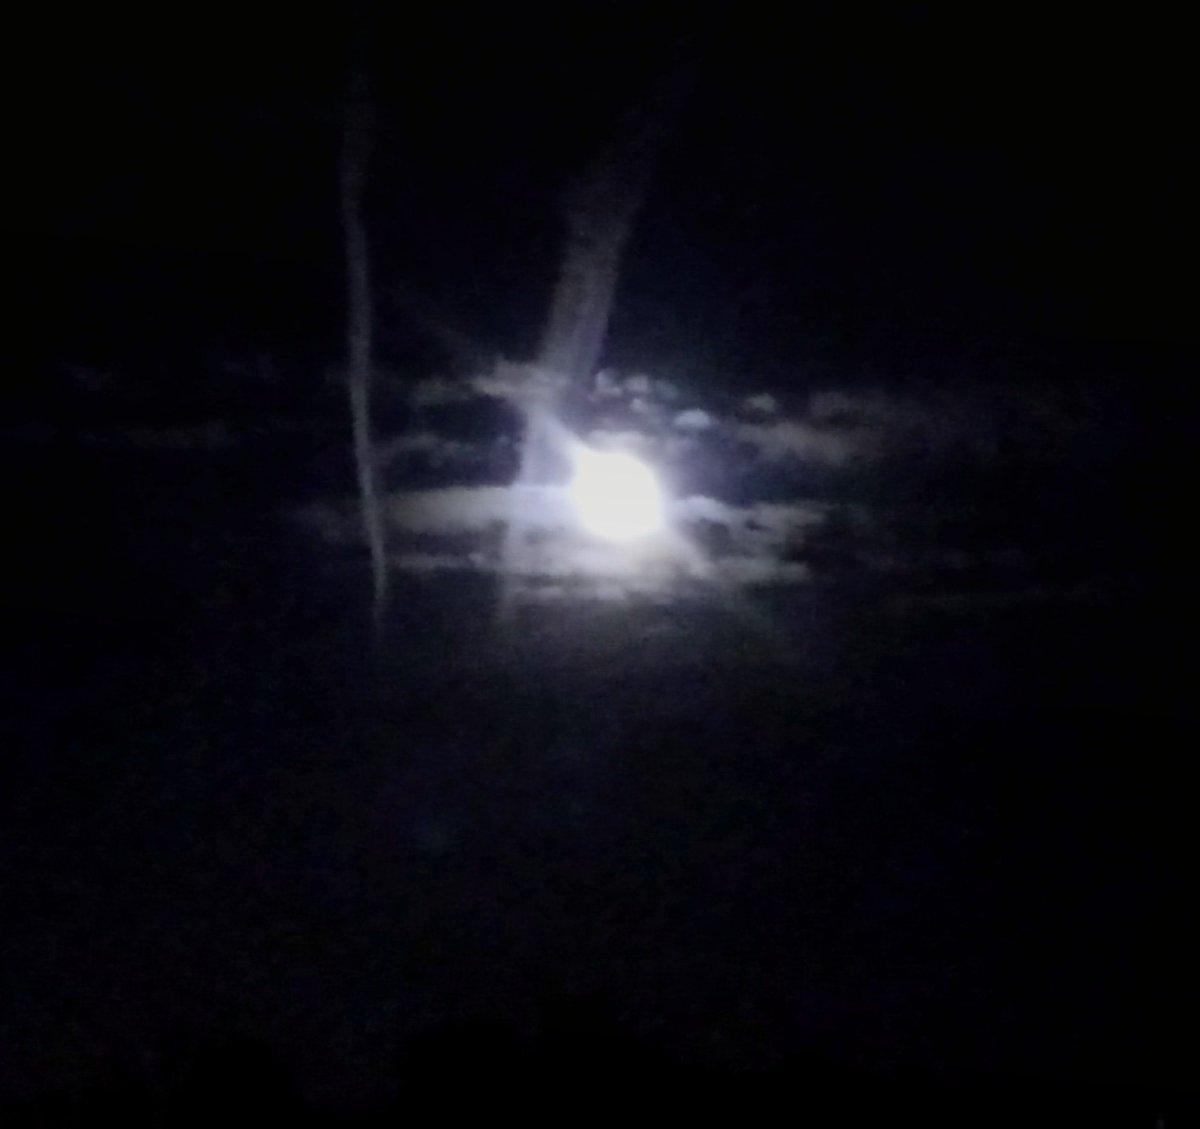 Now I see the beautiful Moon  #beautiful #moon #FullMoon #ColdMoon #MyPhoto #photooftheday #Warszawa #amazing